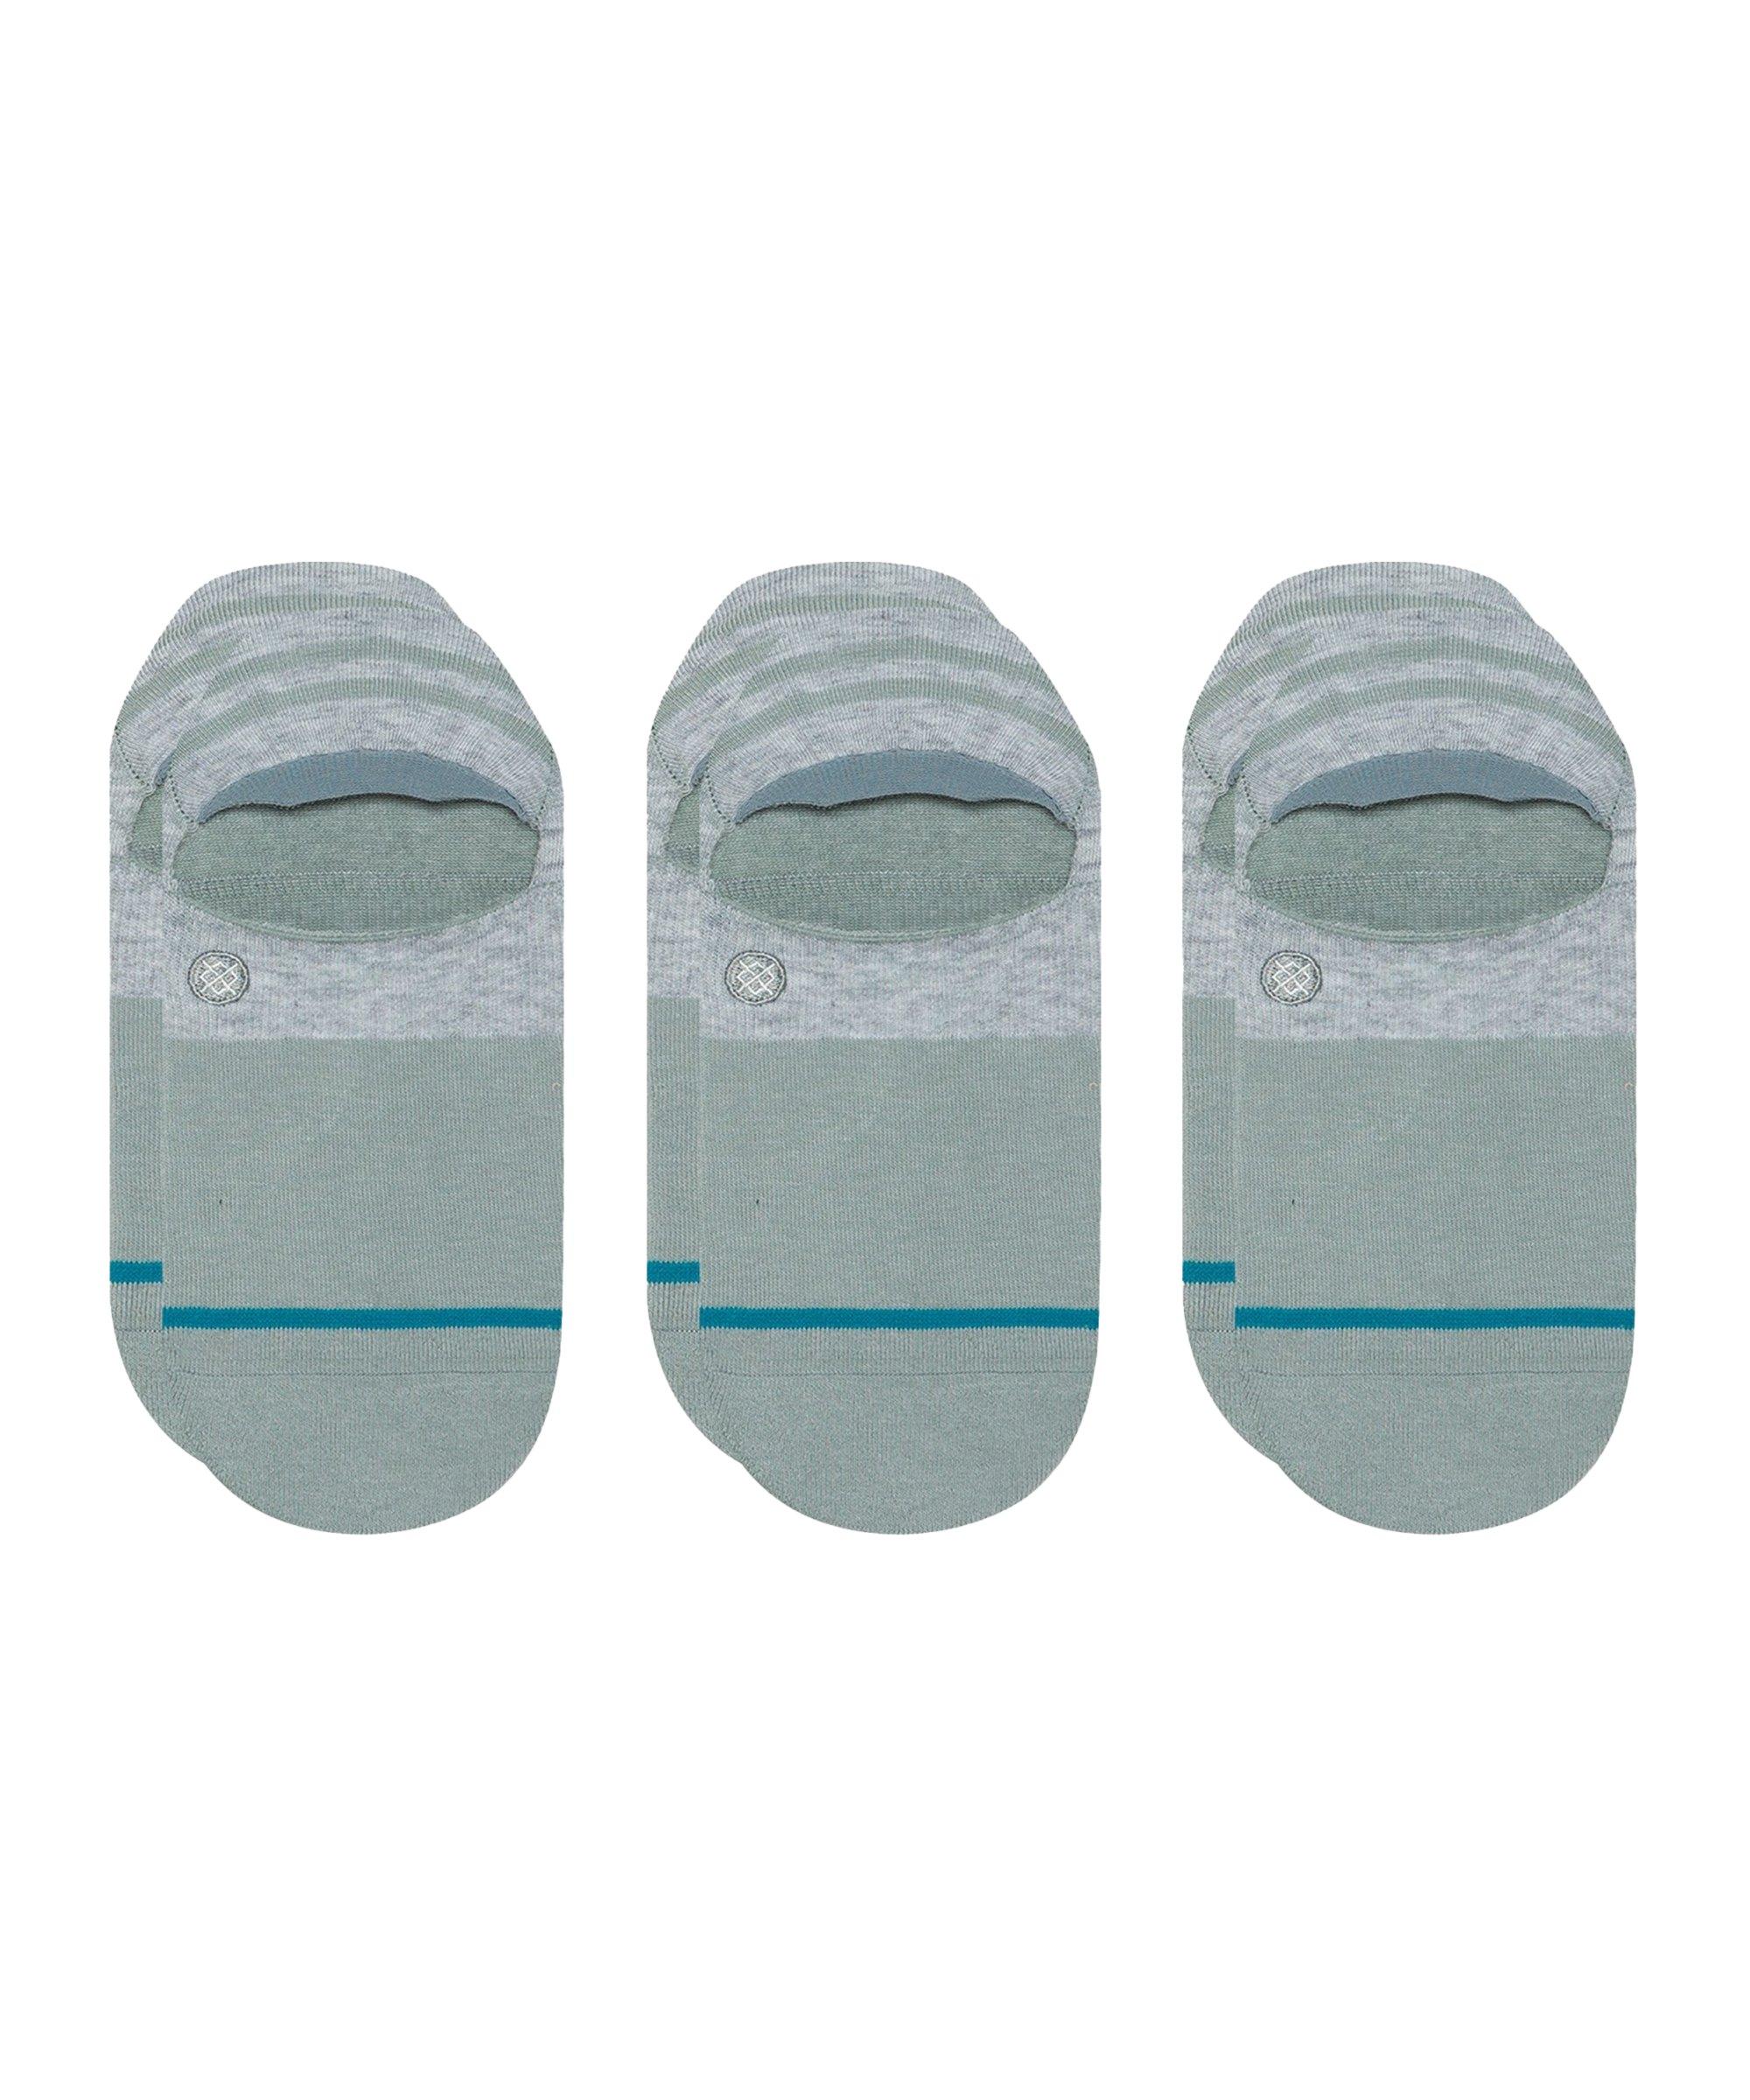 Stance Uncommon Gamut II Socks 3er Pack Grau - grau